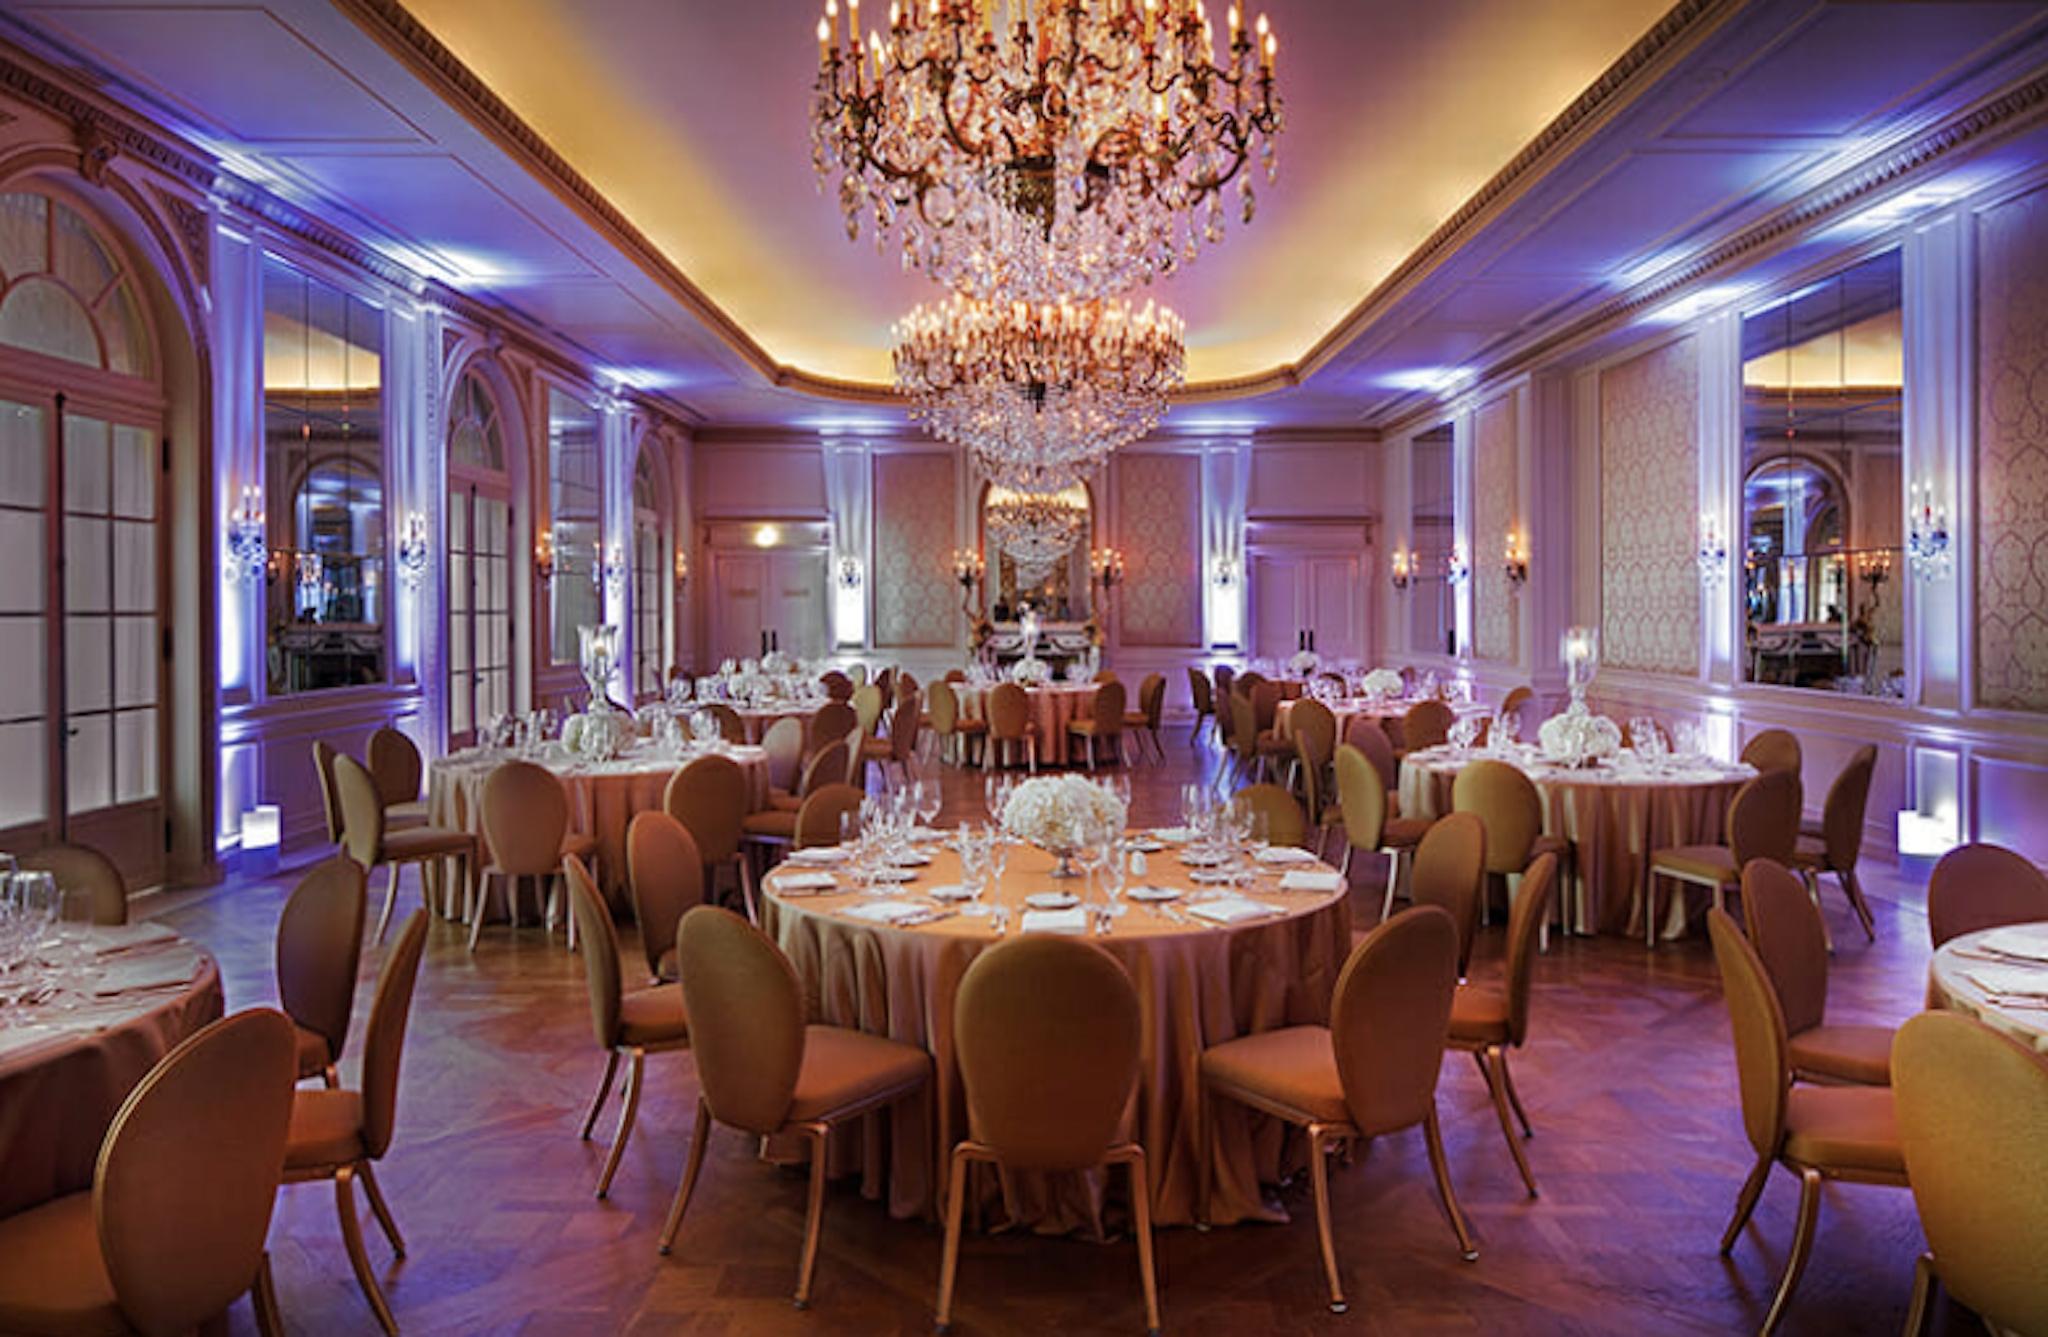 The Westgate Hotel San Diego ballroom